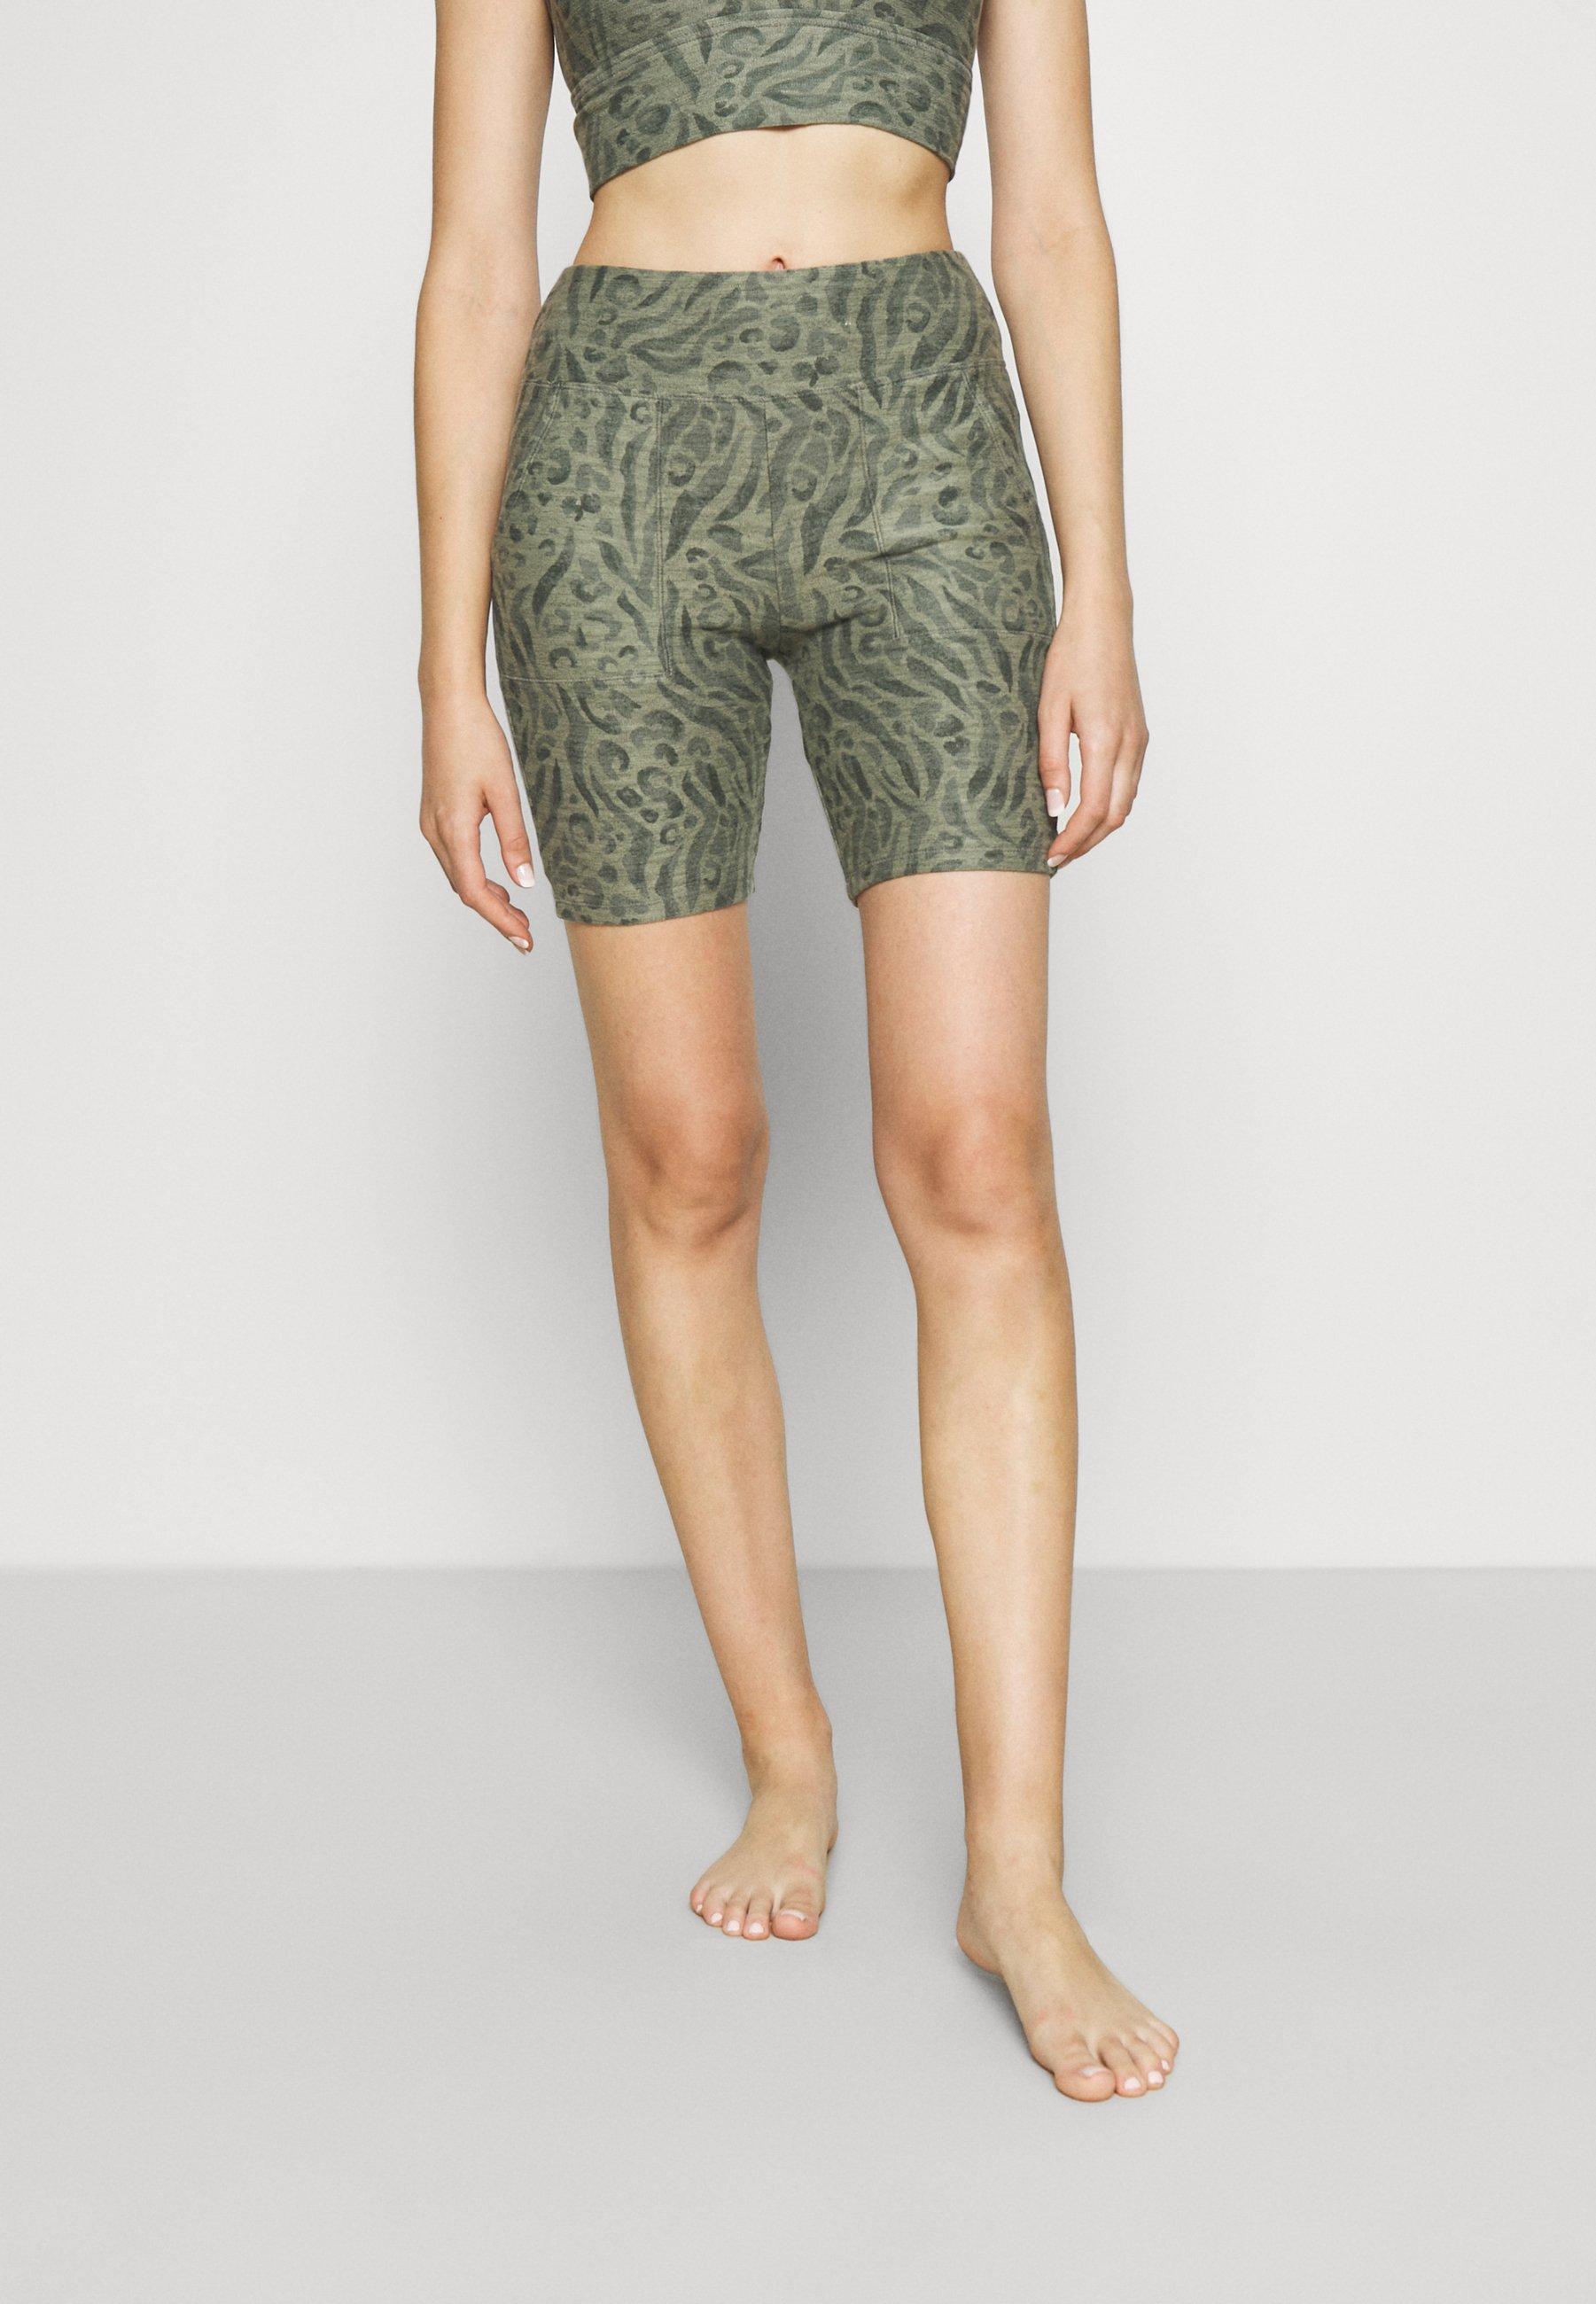 Donna FLEXI CYCLE SHORT - Pantaloni del pigiama